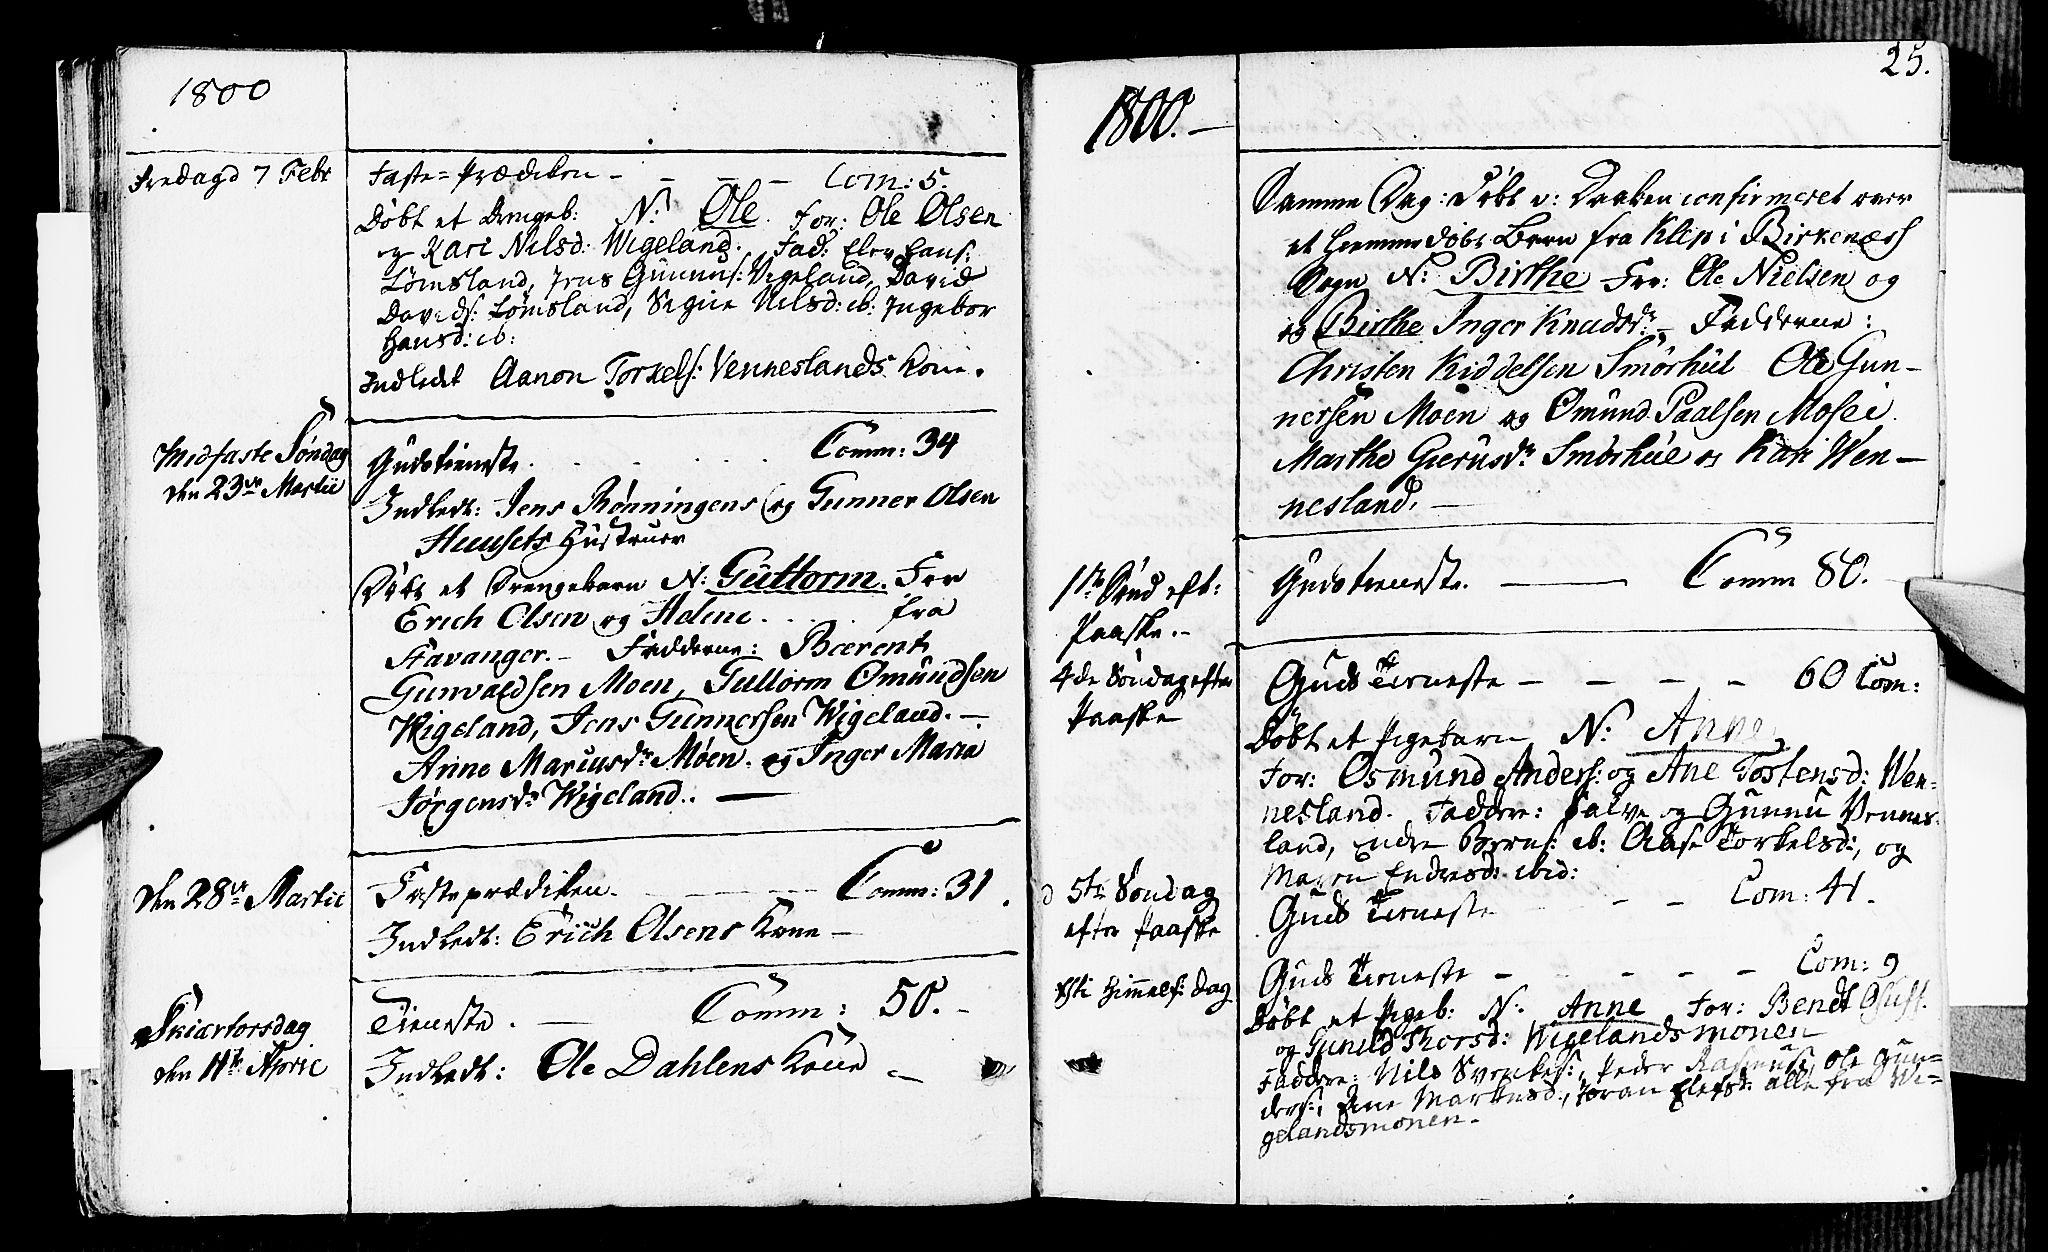 SAK, Vennesla sokneprestkontor, Fa/Fab/L0002: Ministerialbok nr. A 2, 1794-1834, s. 25